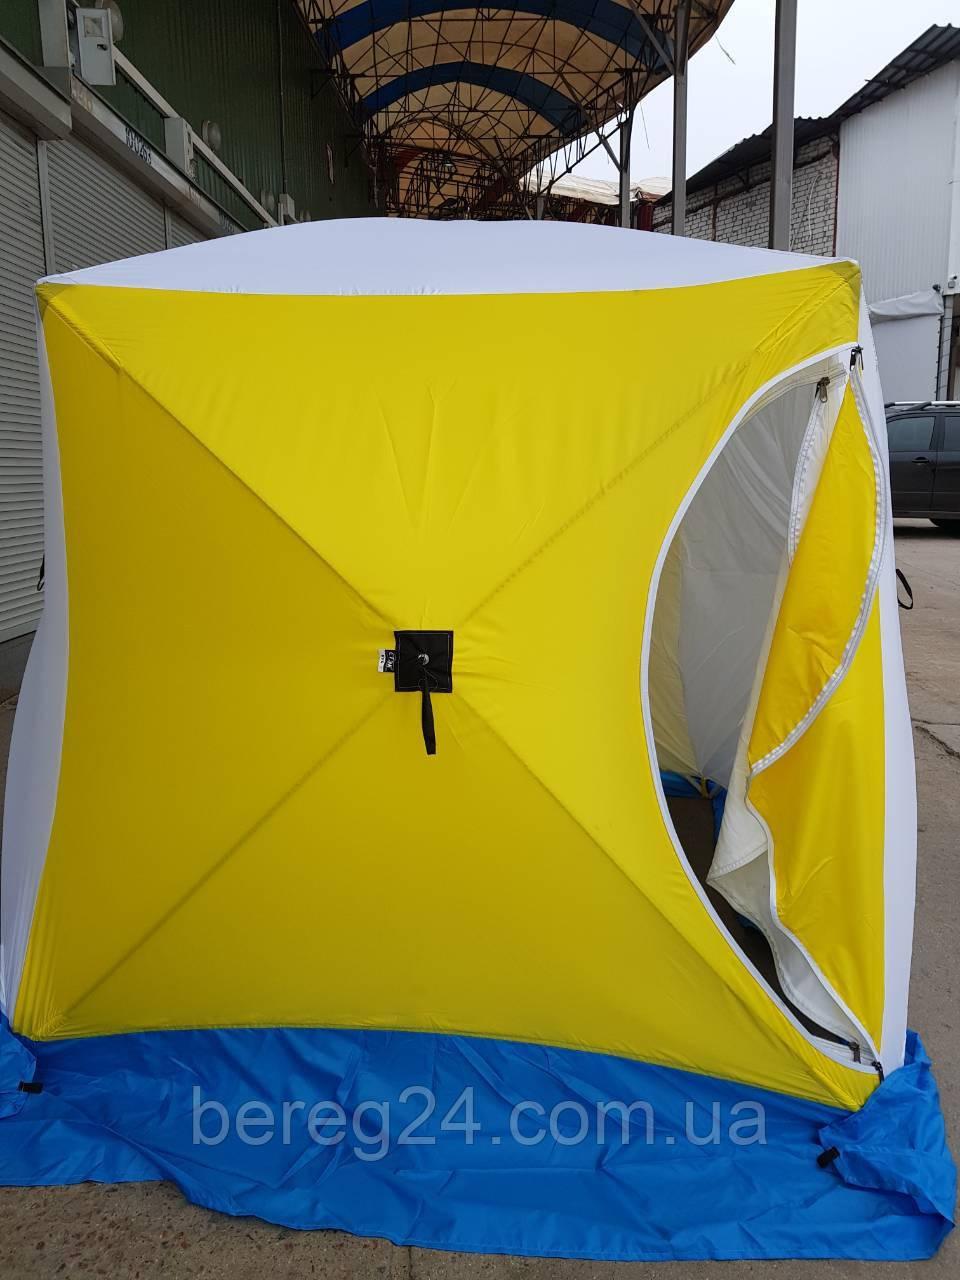 Зимняя палатка для рыбалки Стэк Куб-3 OXFORD 300 2 слойная 220х200 см